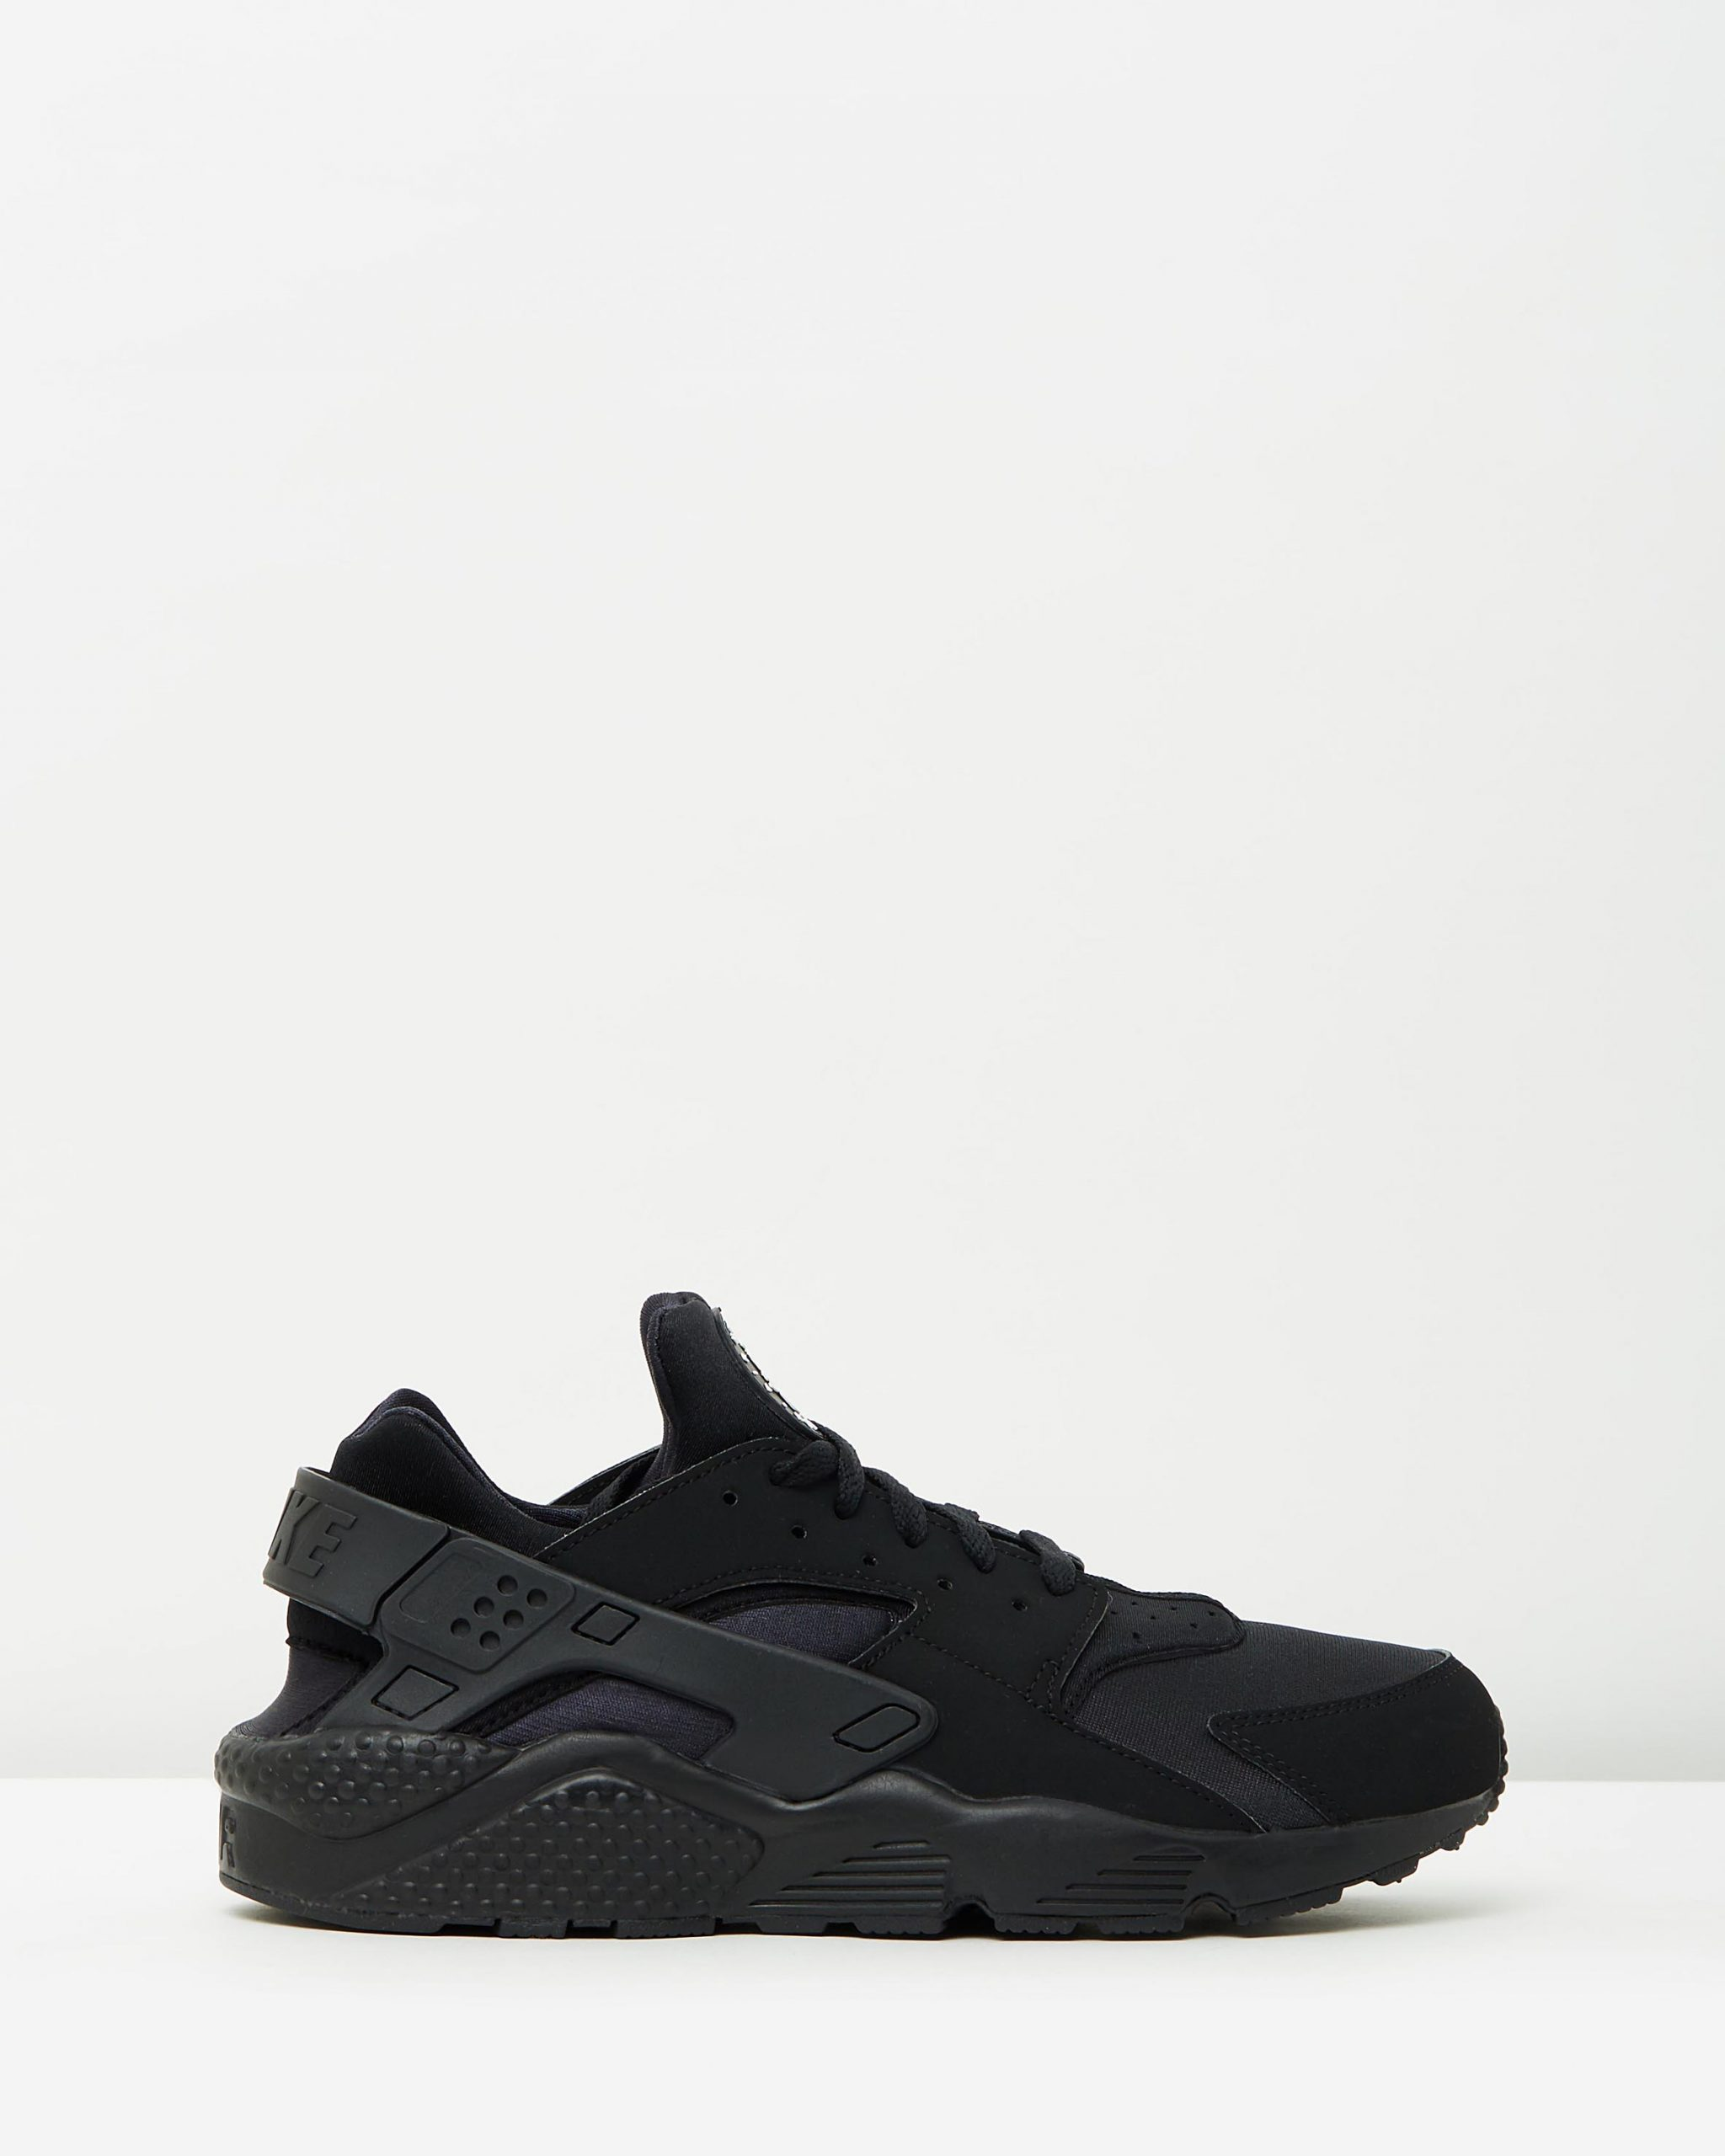 Nike Men's Air Huarache Run Black